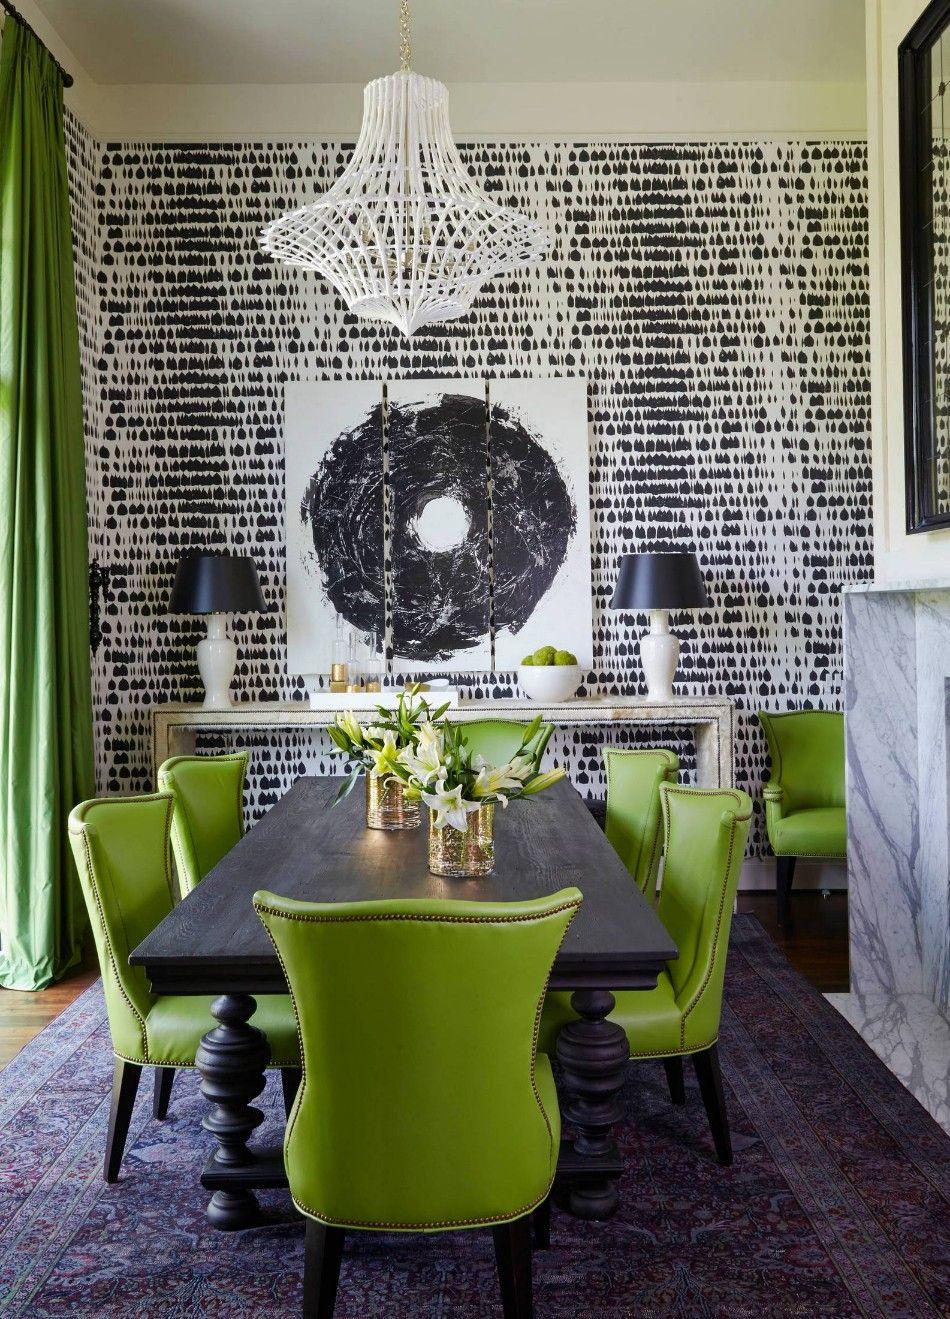 Inspirational Dramatic Dining Rooms Www Bocadolobo Com Bocadolobo Luxuryfurniture Exclusi Green Dining Room Black And White Dining Room White Dining Room